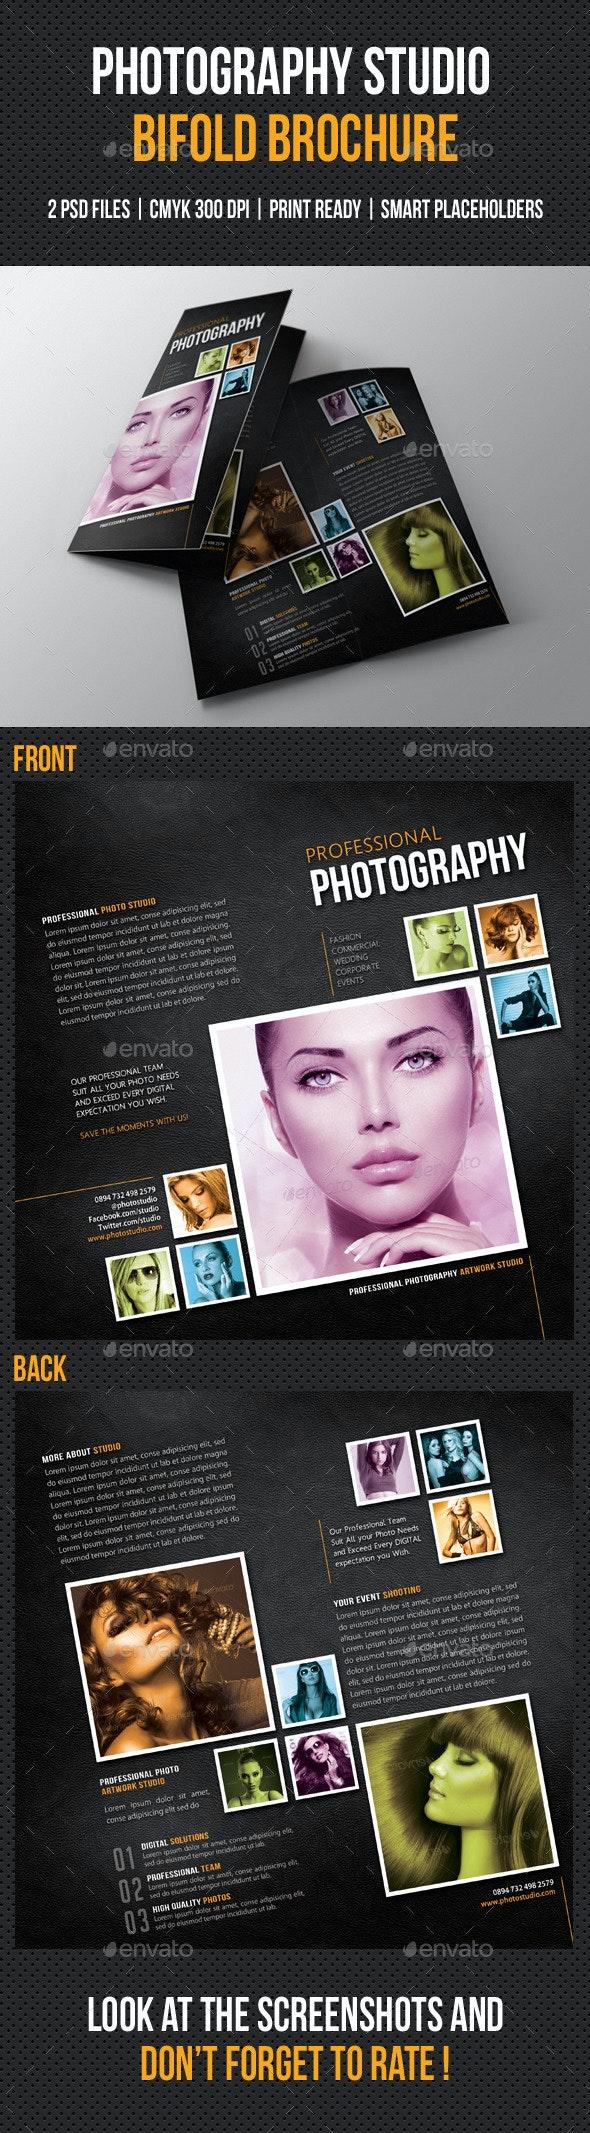 Photography Studio Bifold Brochure 02 - Portfolio Brochures